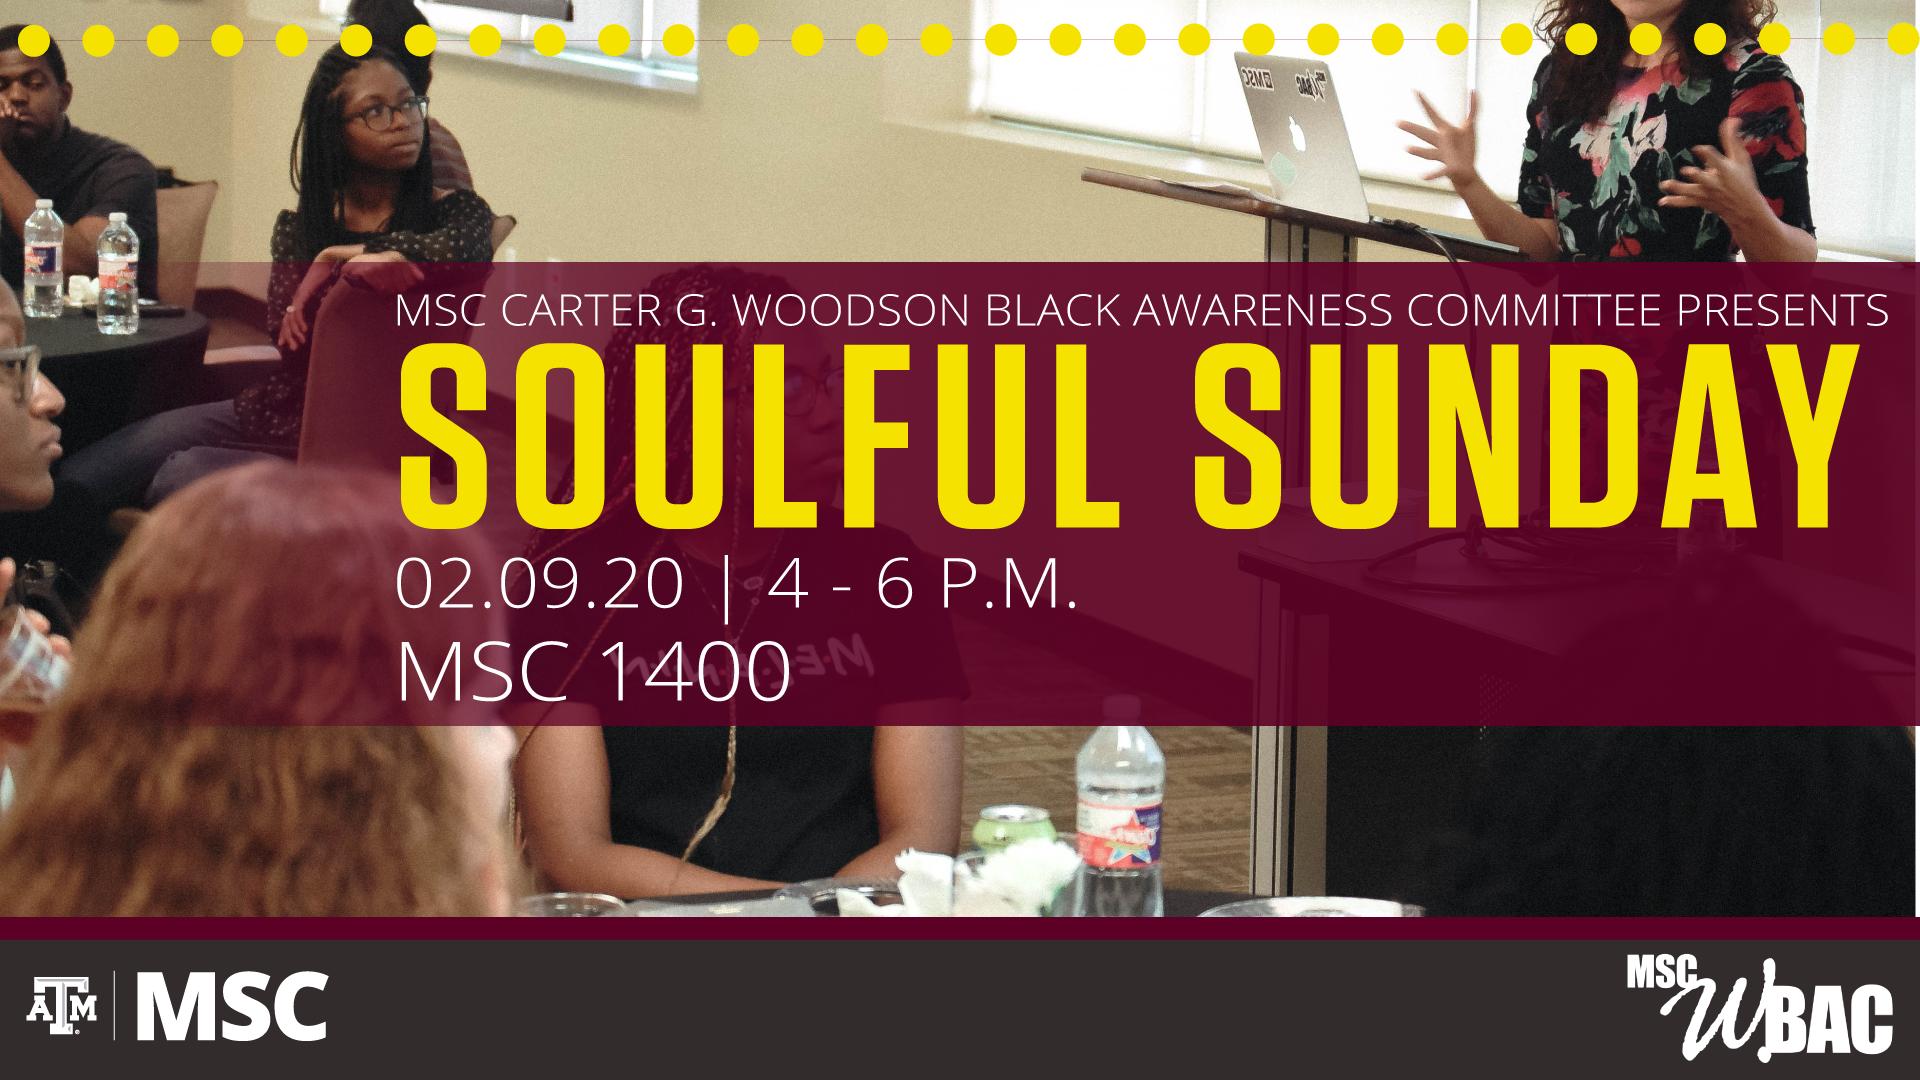 MSC WBAC presents Soulful Sunday on February 9, 2020, 4-6 p.m. in MSC 1400.